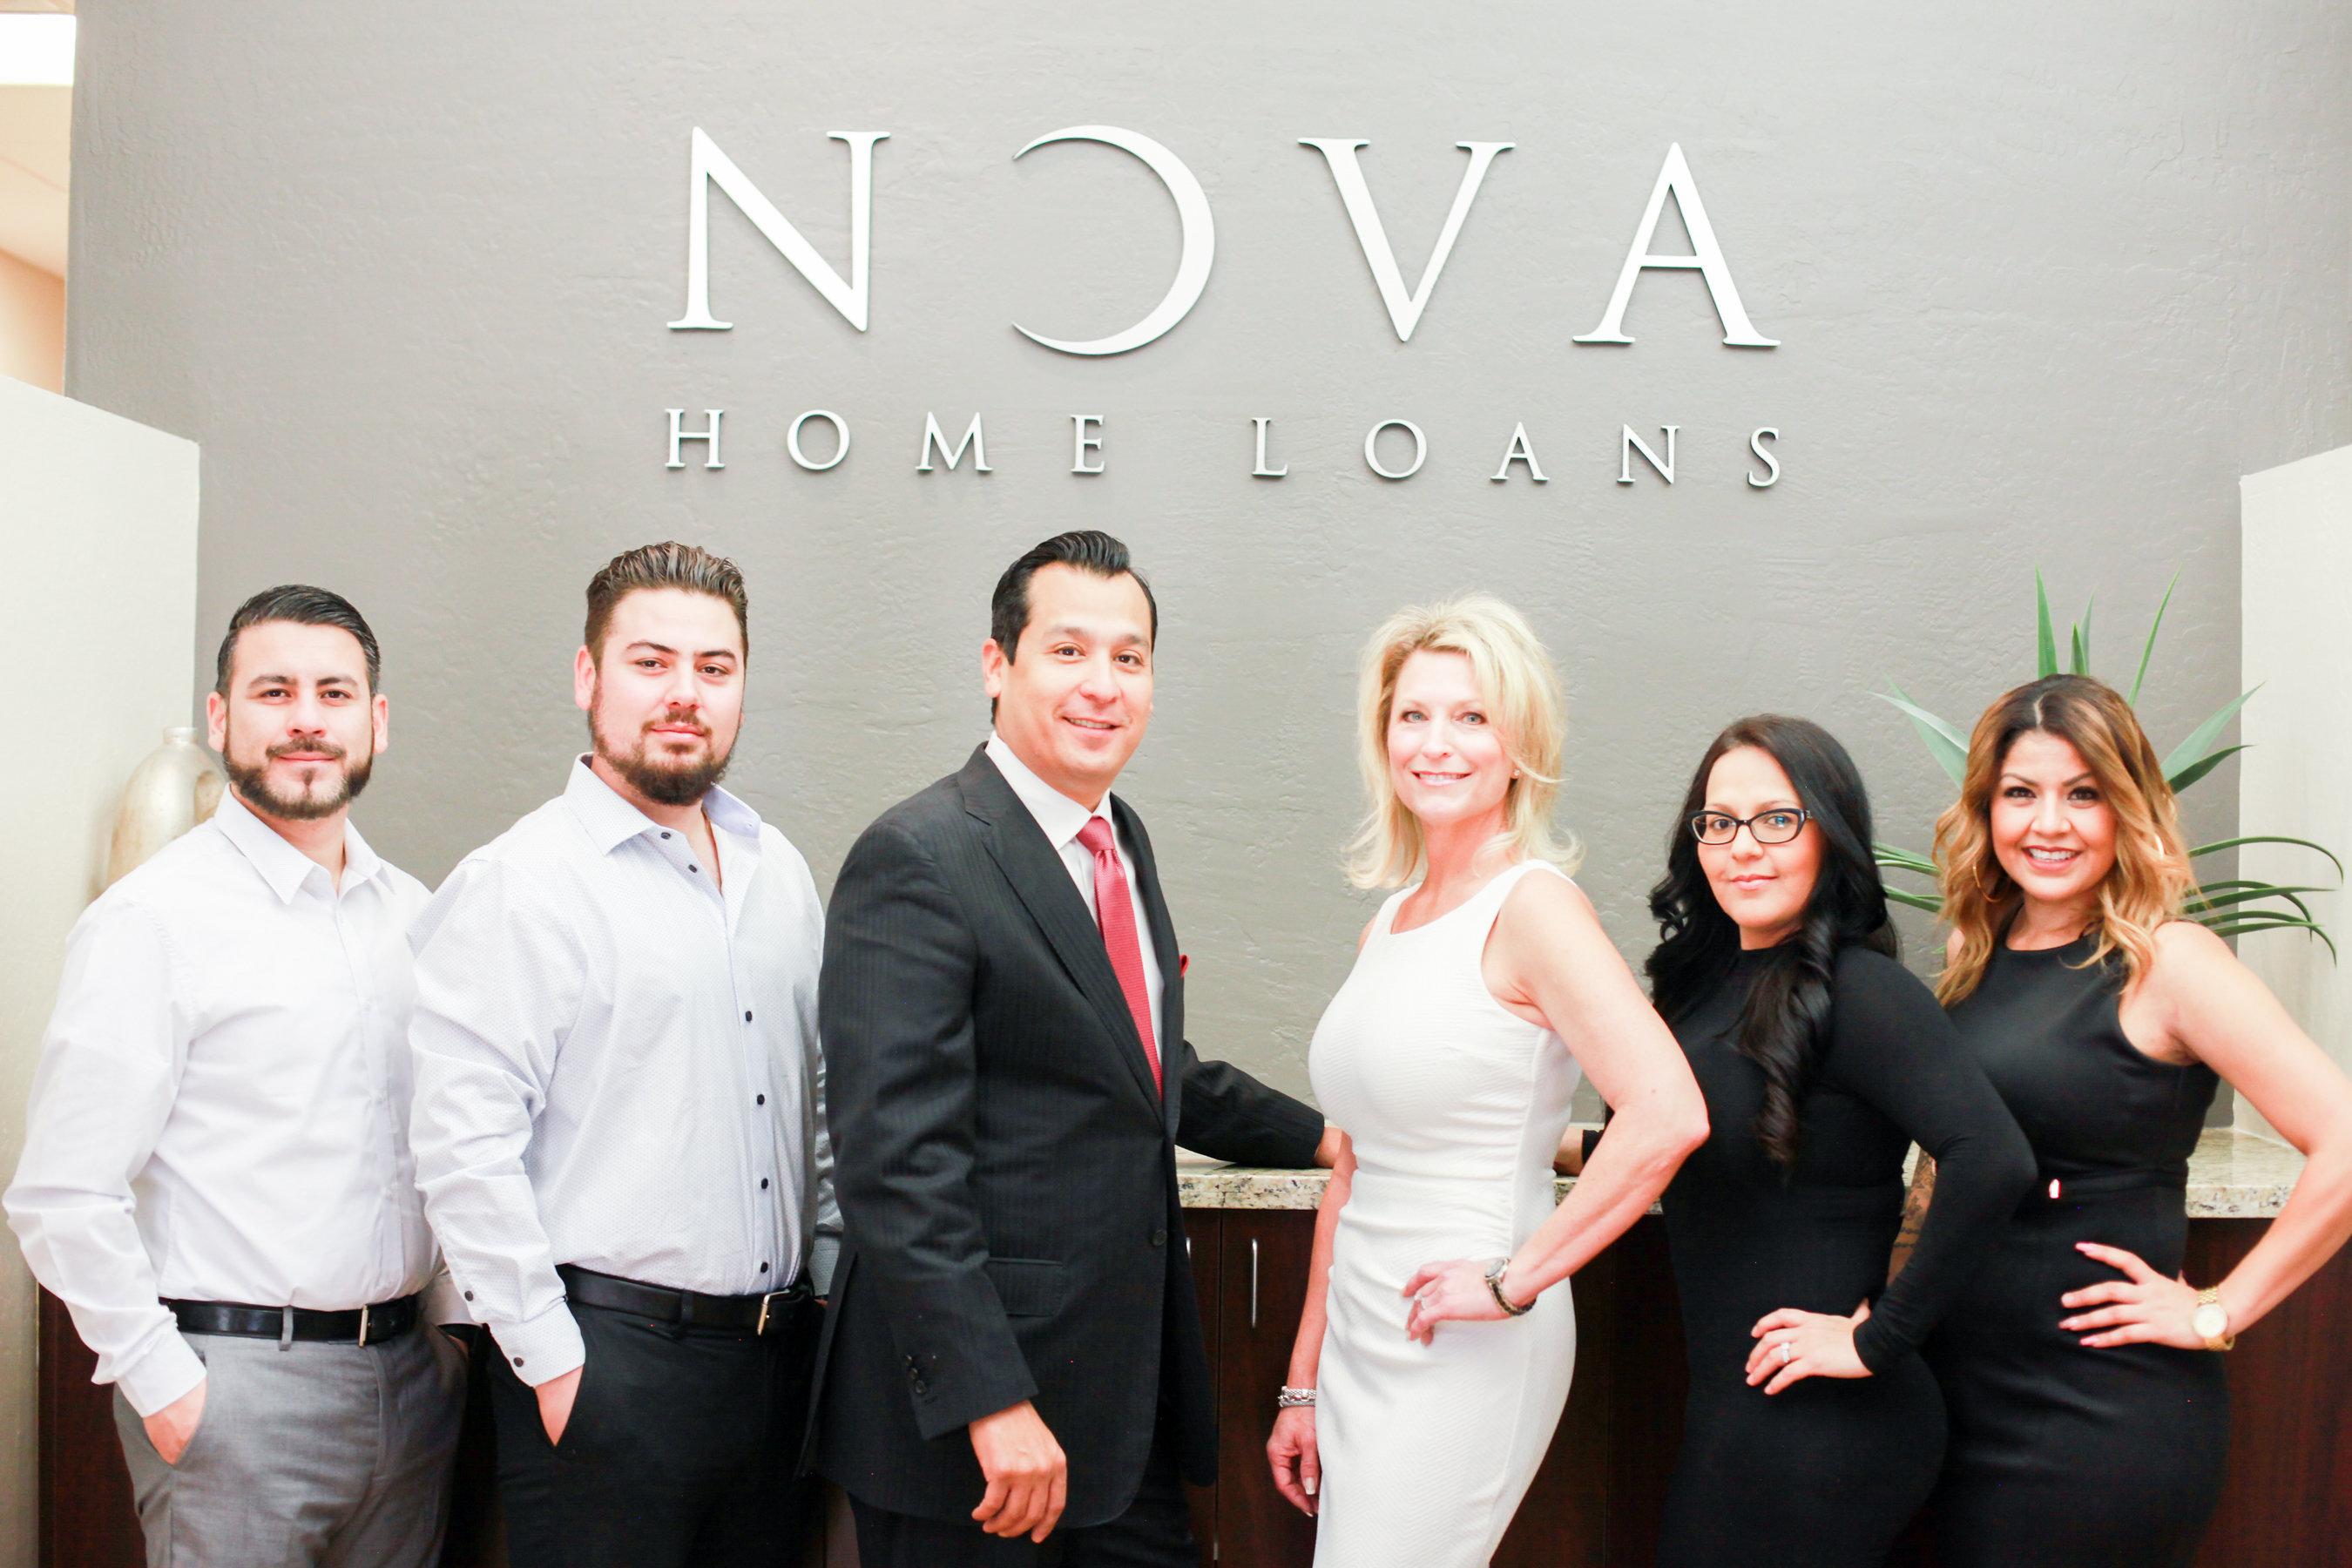 Nova Home Loans - The A Team